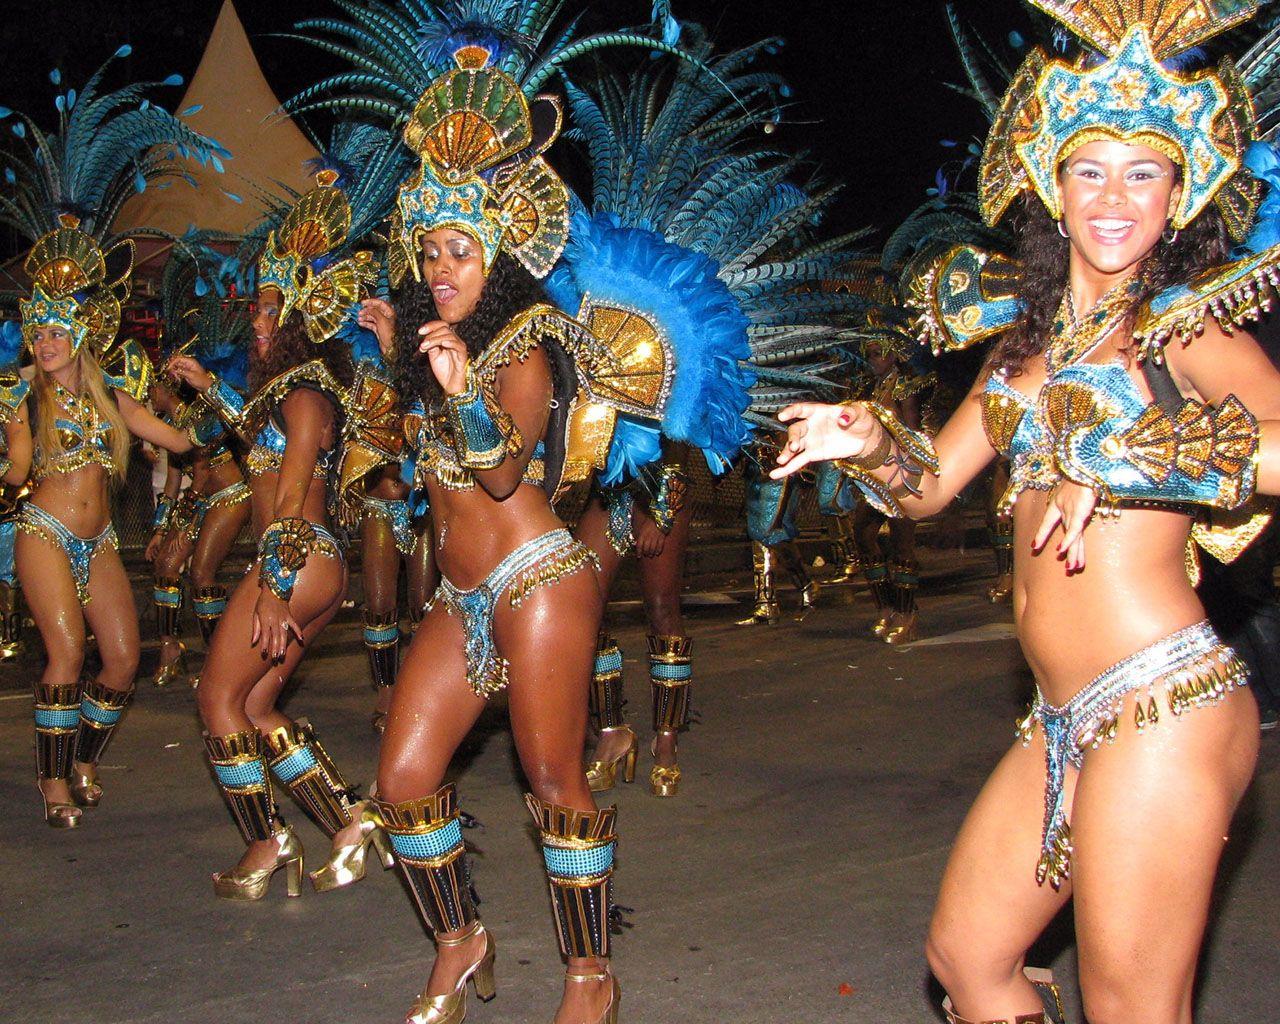 Rio de janero strip clubs